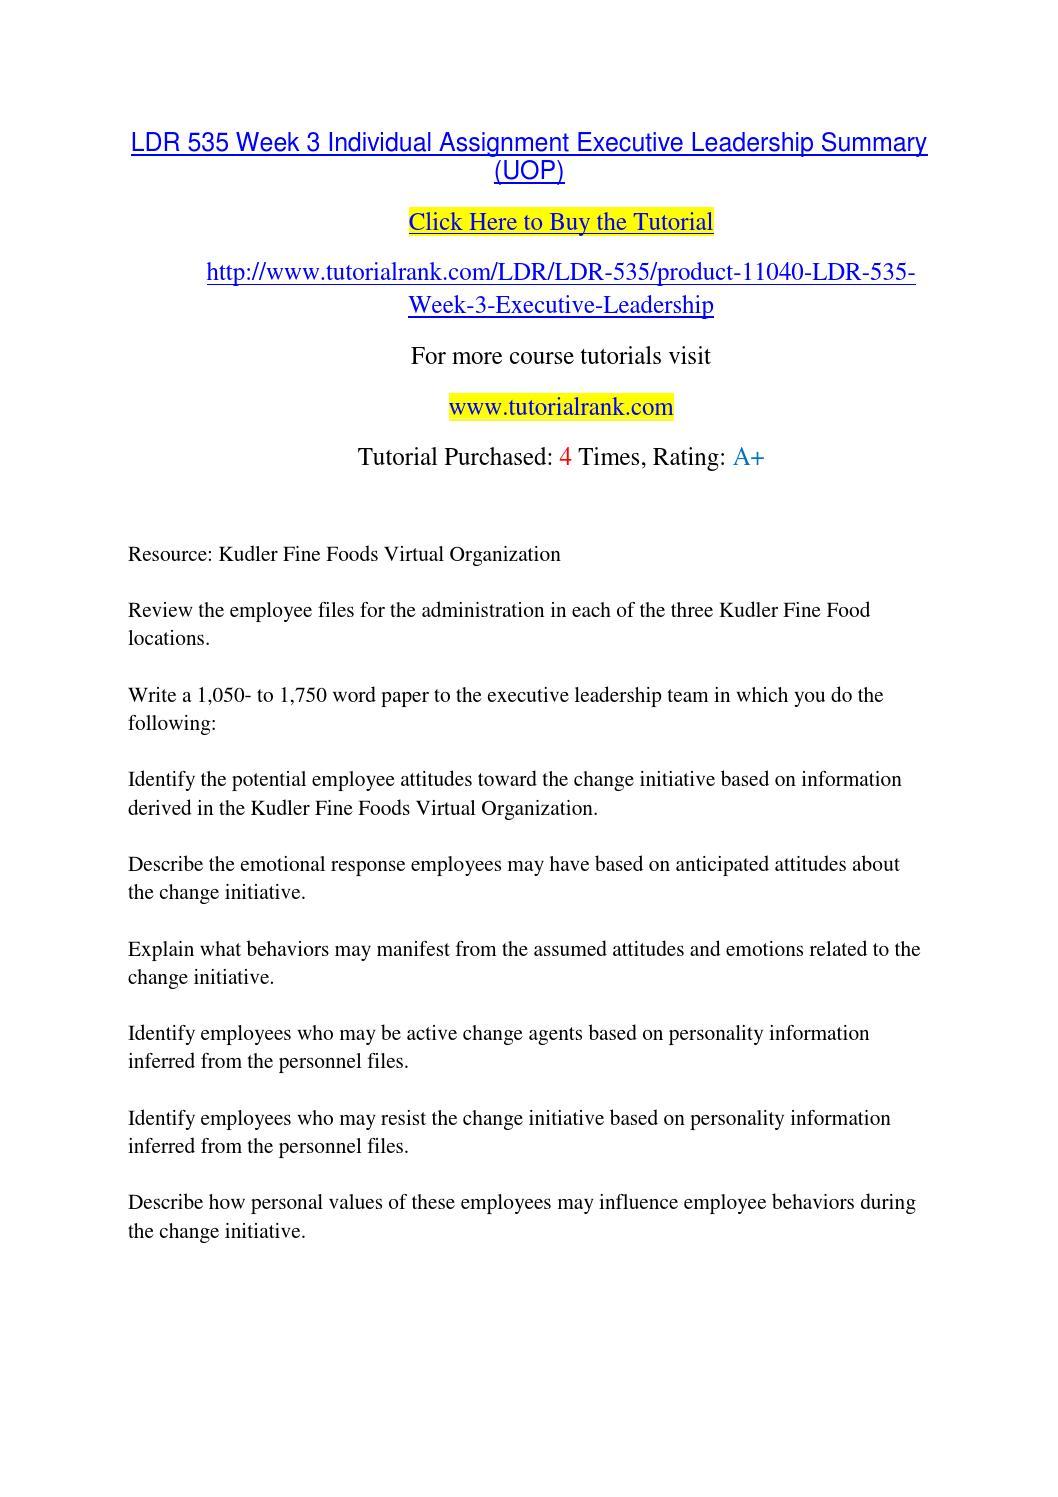 Kudler Fine Foods Management Assignment